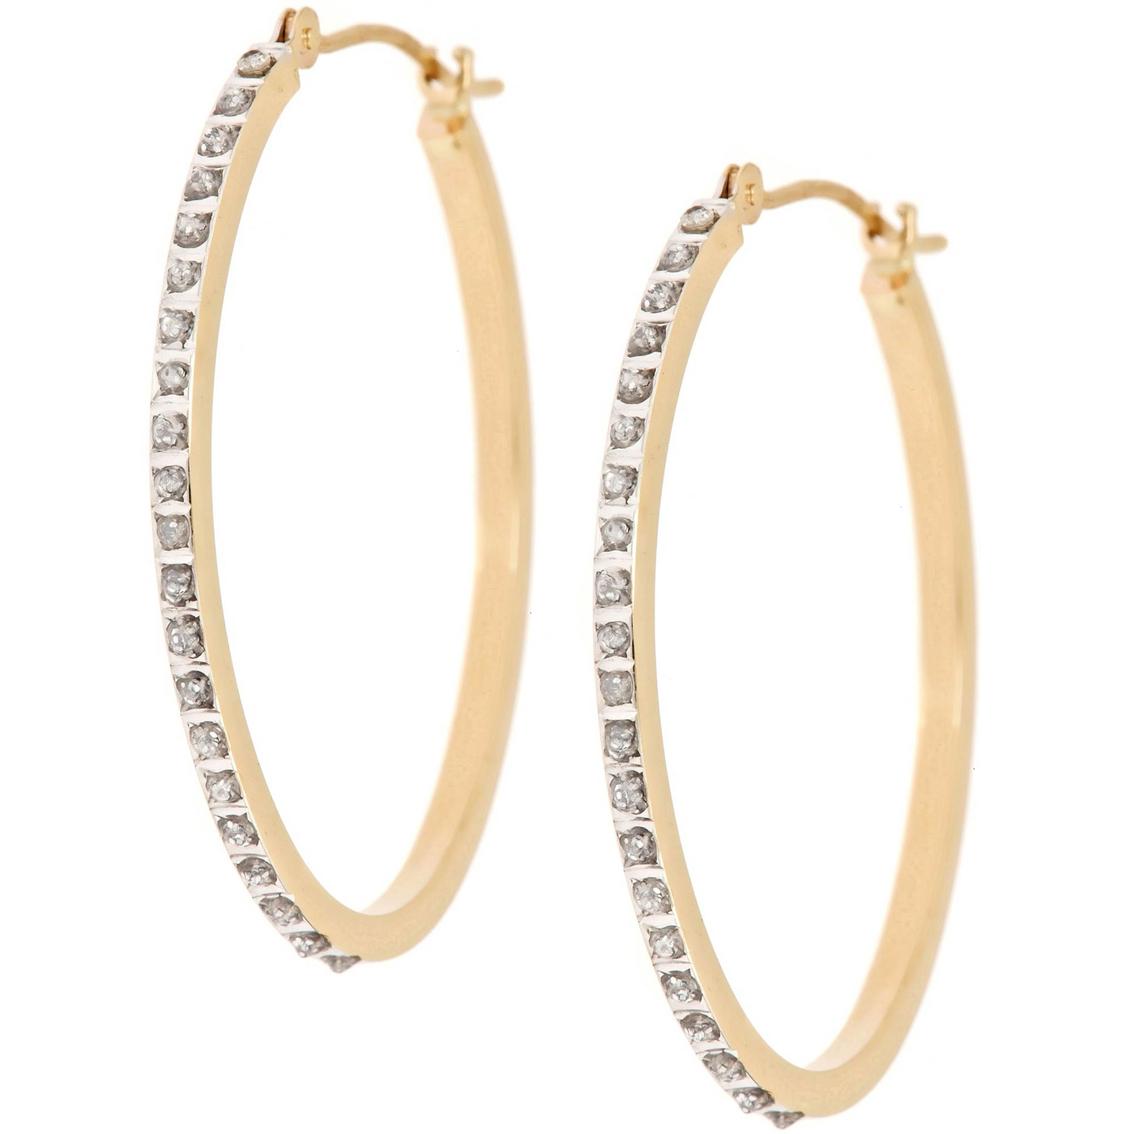 14k yellow gold diamond fascination oval hoop earrings diamond hoop